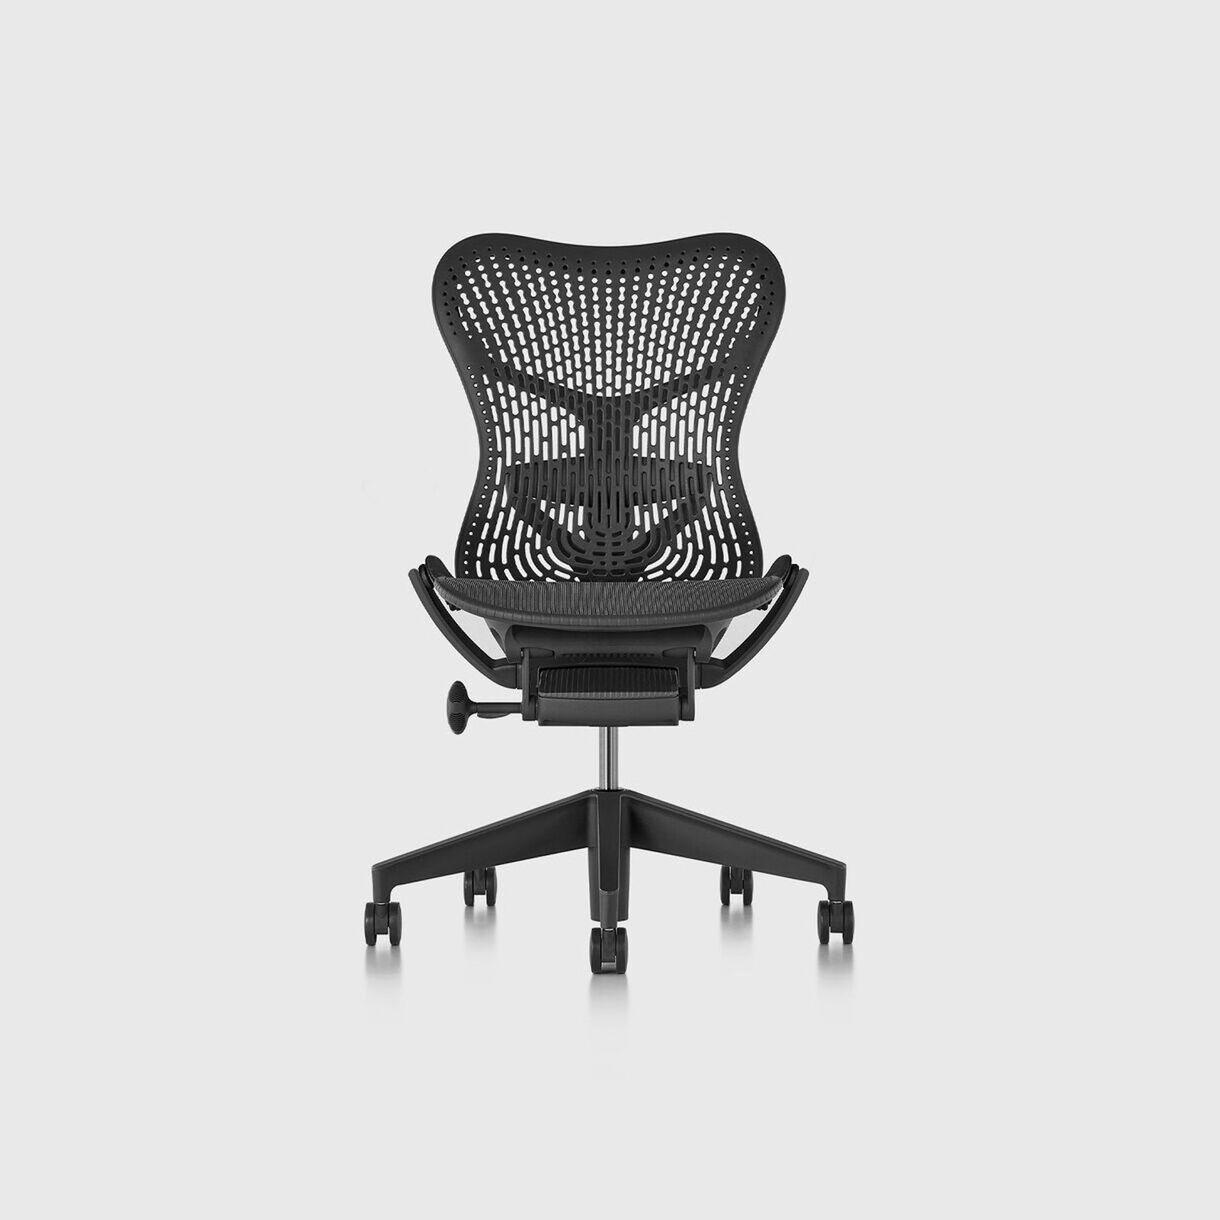 Mirra 2 Work Chair - TriFlex Graphite, Graphite Base & Frame - No Arms